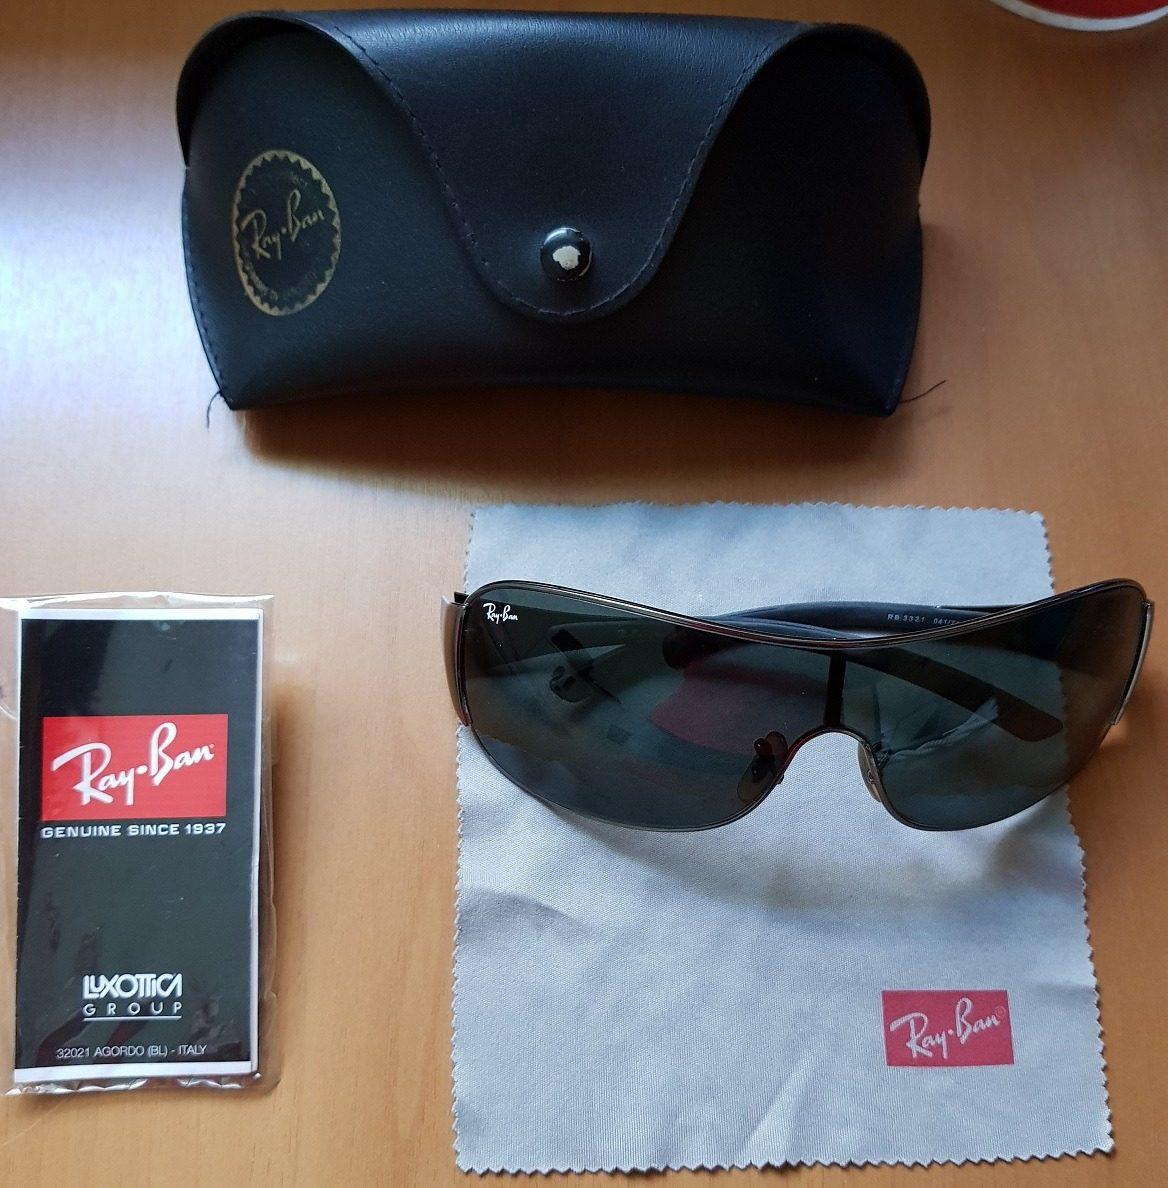 9a951dda813eb Óculos De Sol Rayban Original Na Caixa - Modelo Aviador - R  200